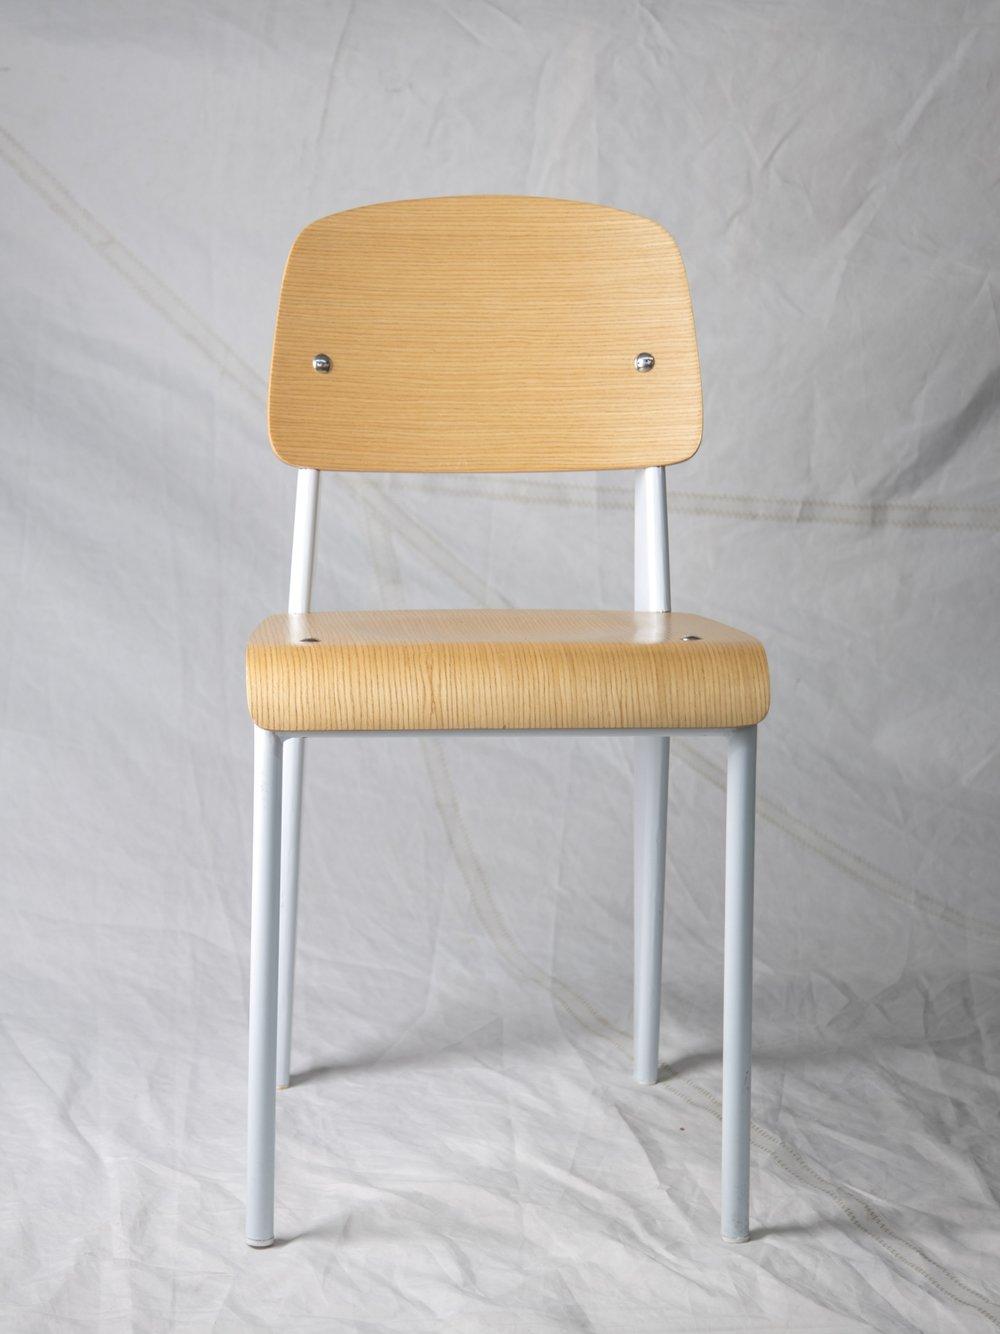 "CH056  Prouvé style chair, white/wood 32"" H x 16"" W x 19"" D  $100/week"